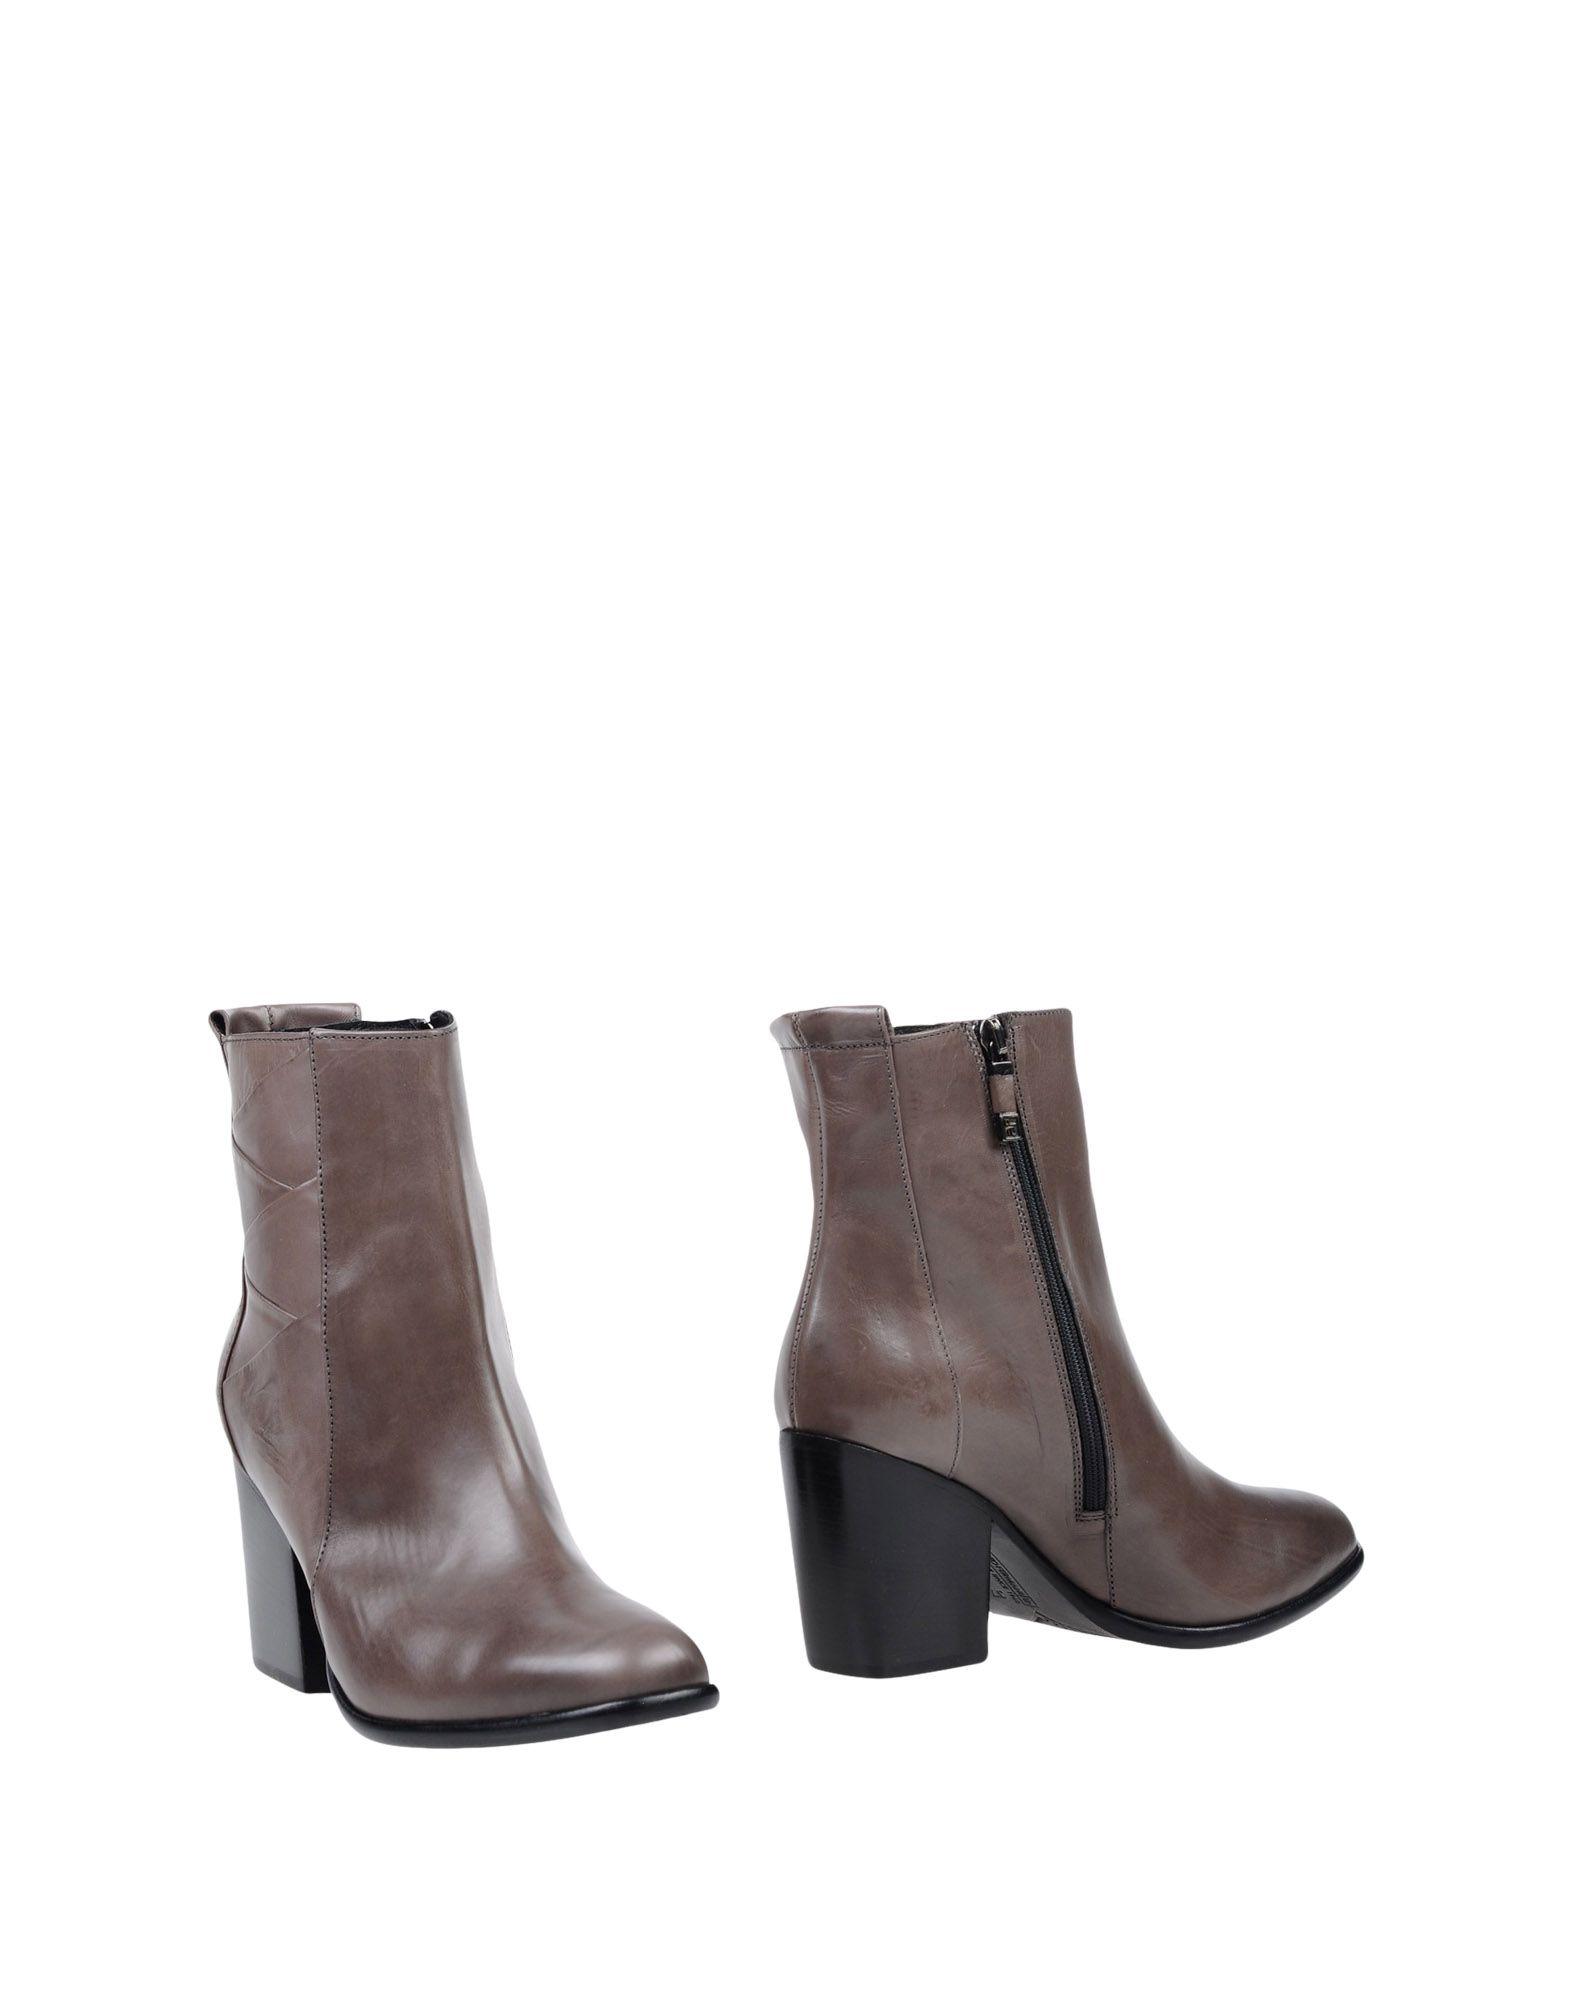 Alberto Fermani Stiefelette Damen 11380853GO  11380853GO Damen Gute Qualität beliebte Schuhe a663e2